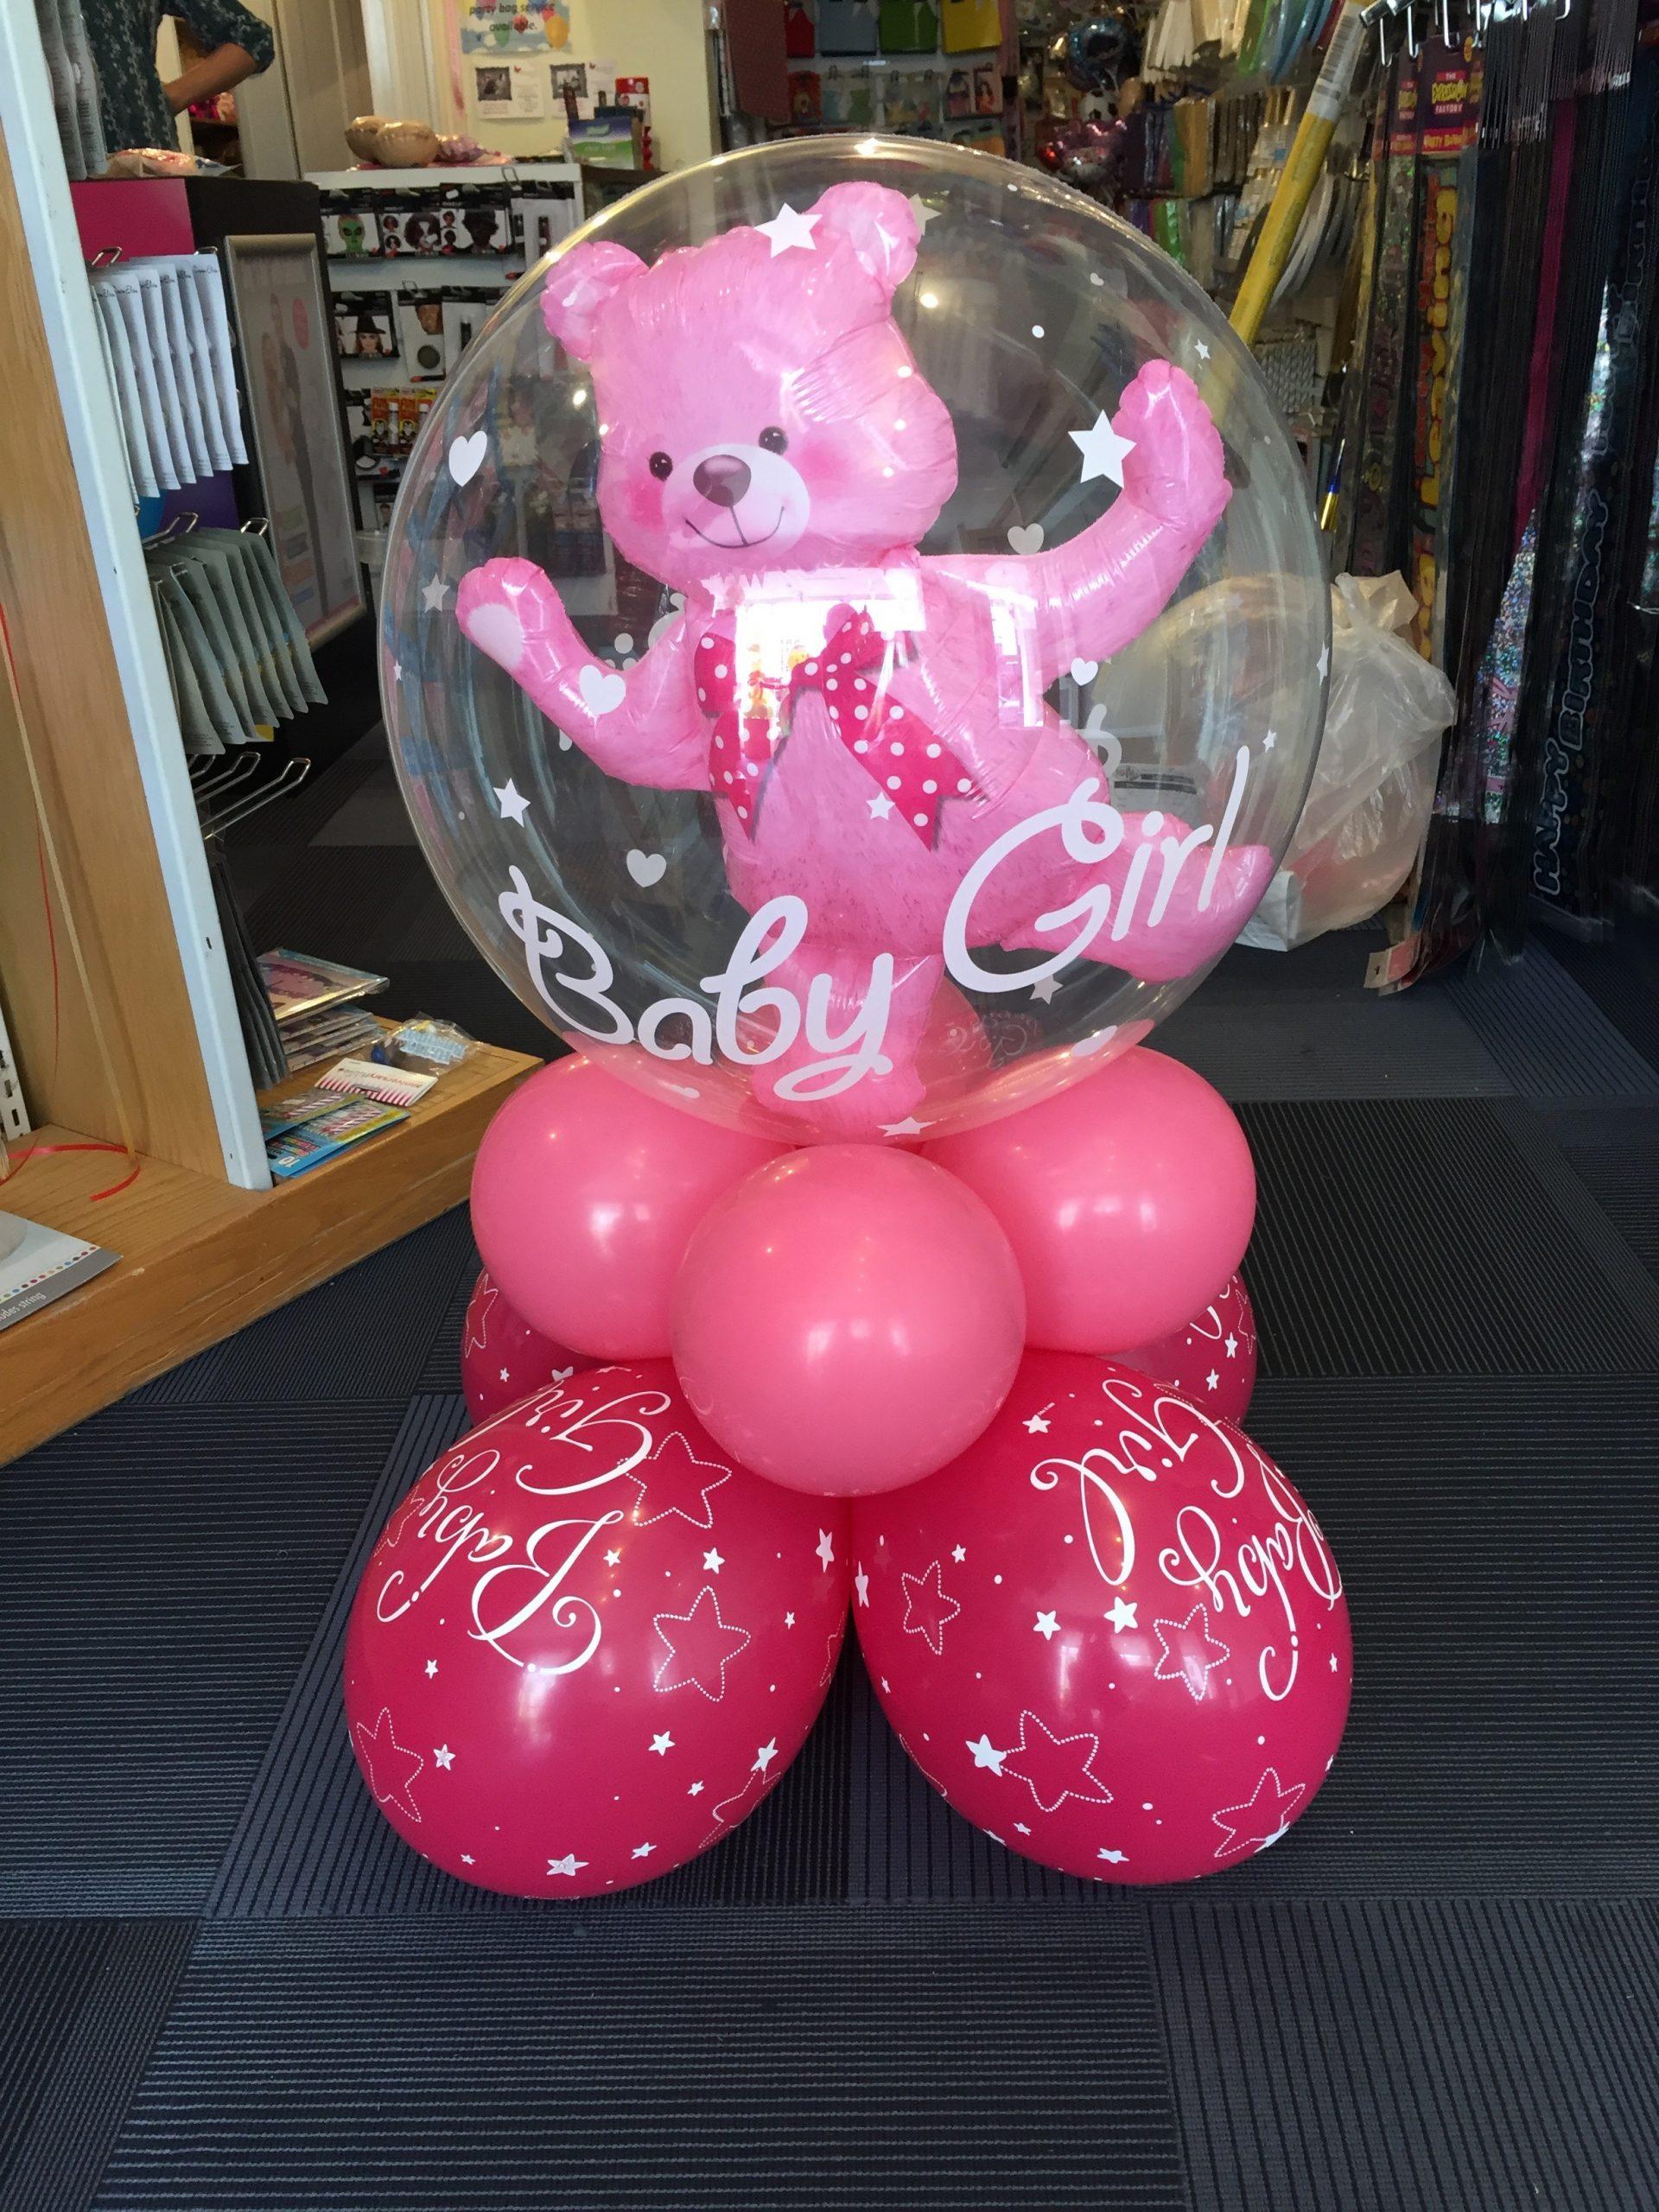 Double bubble baby girl super decoration